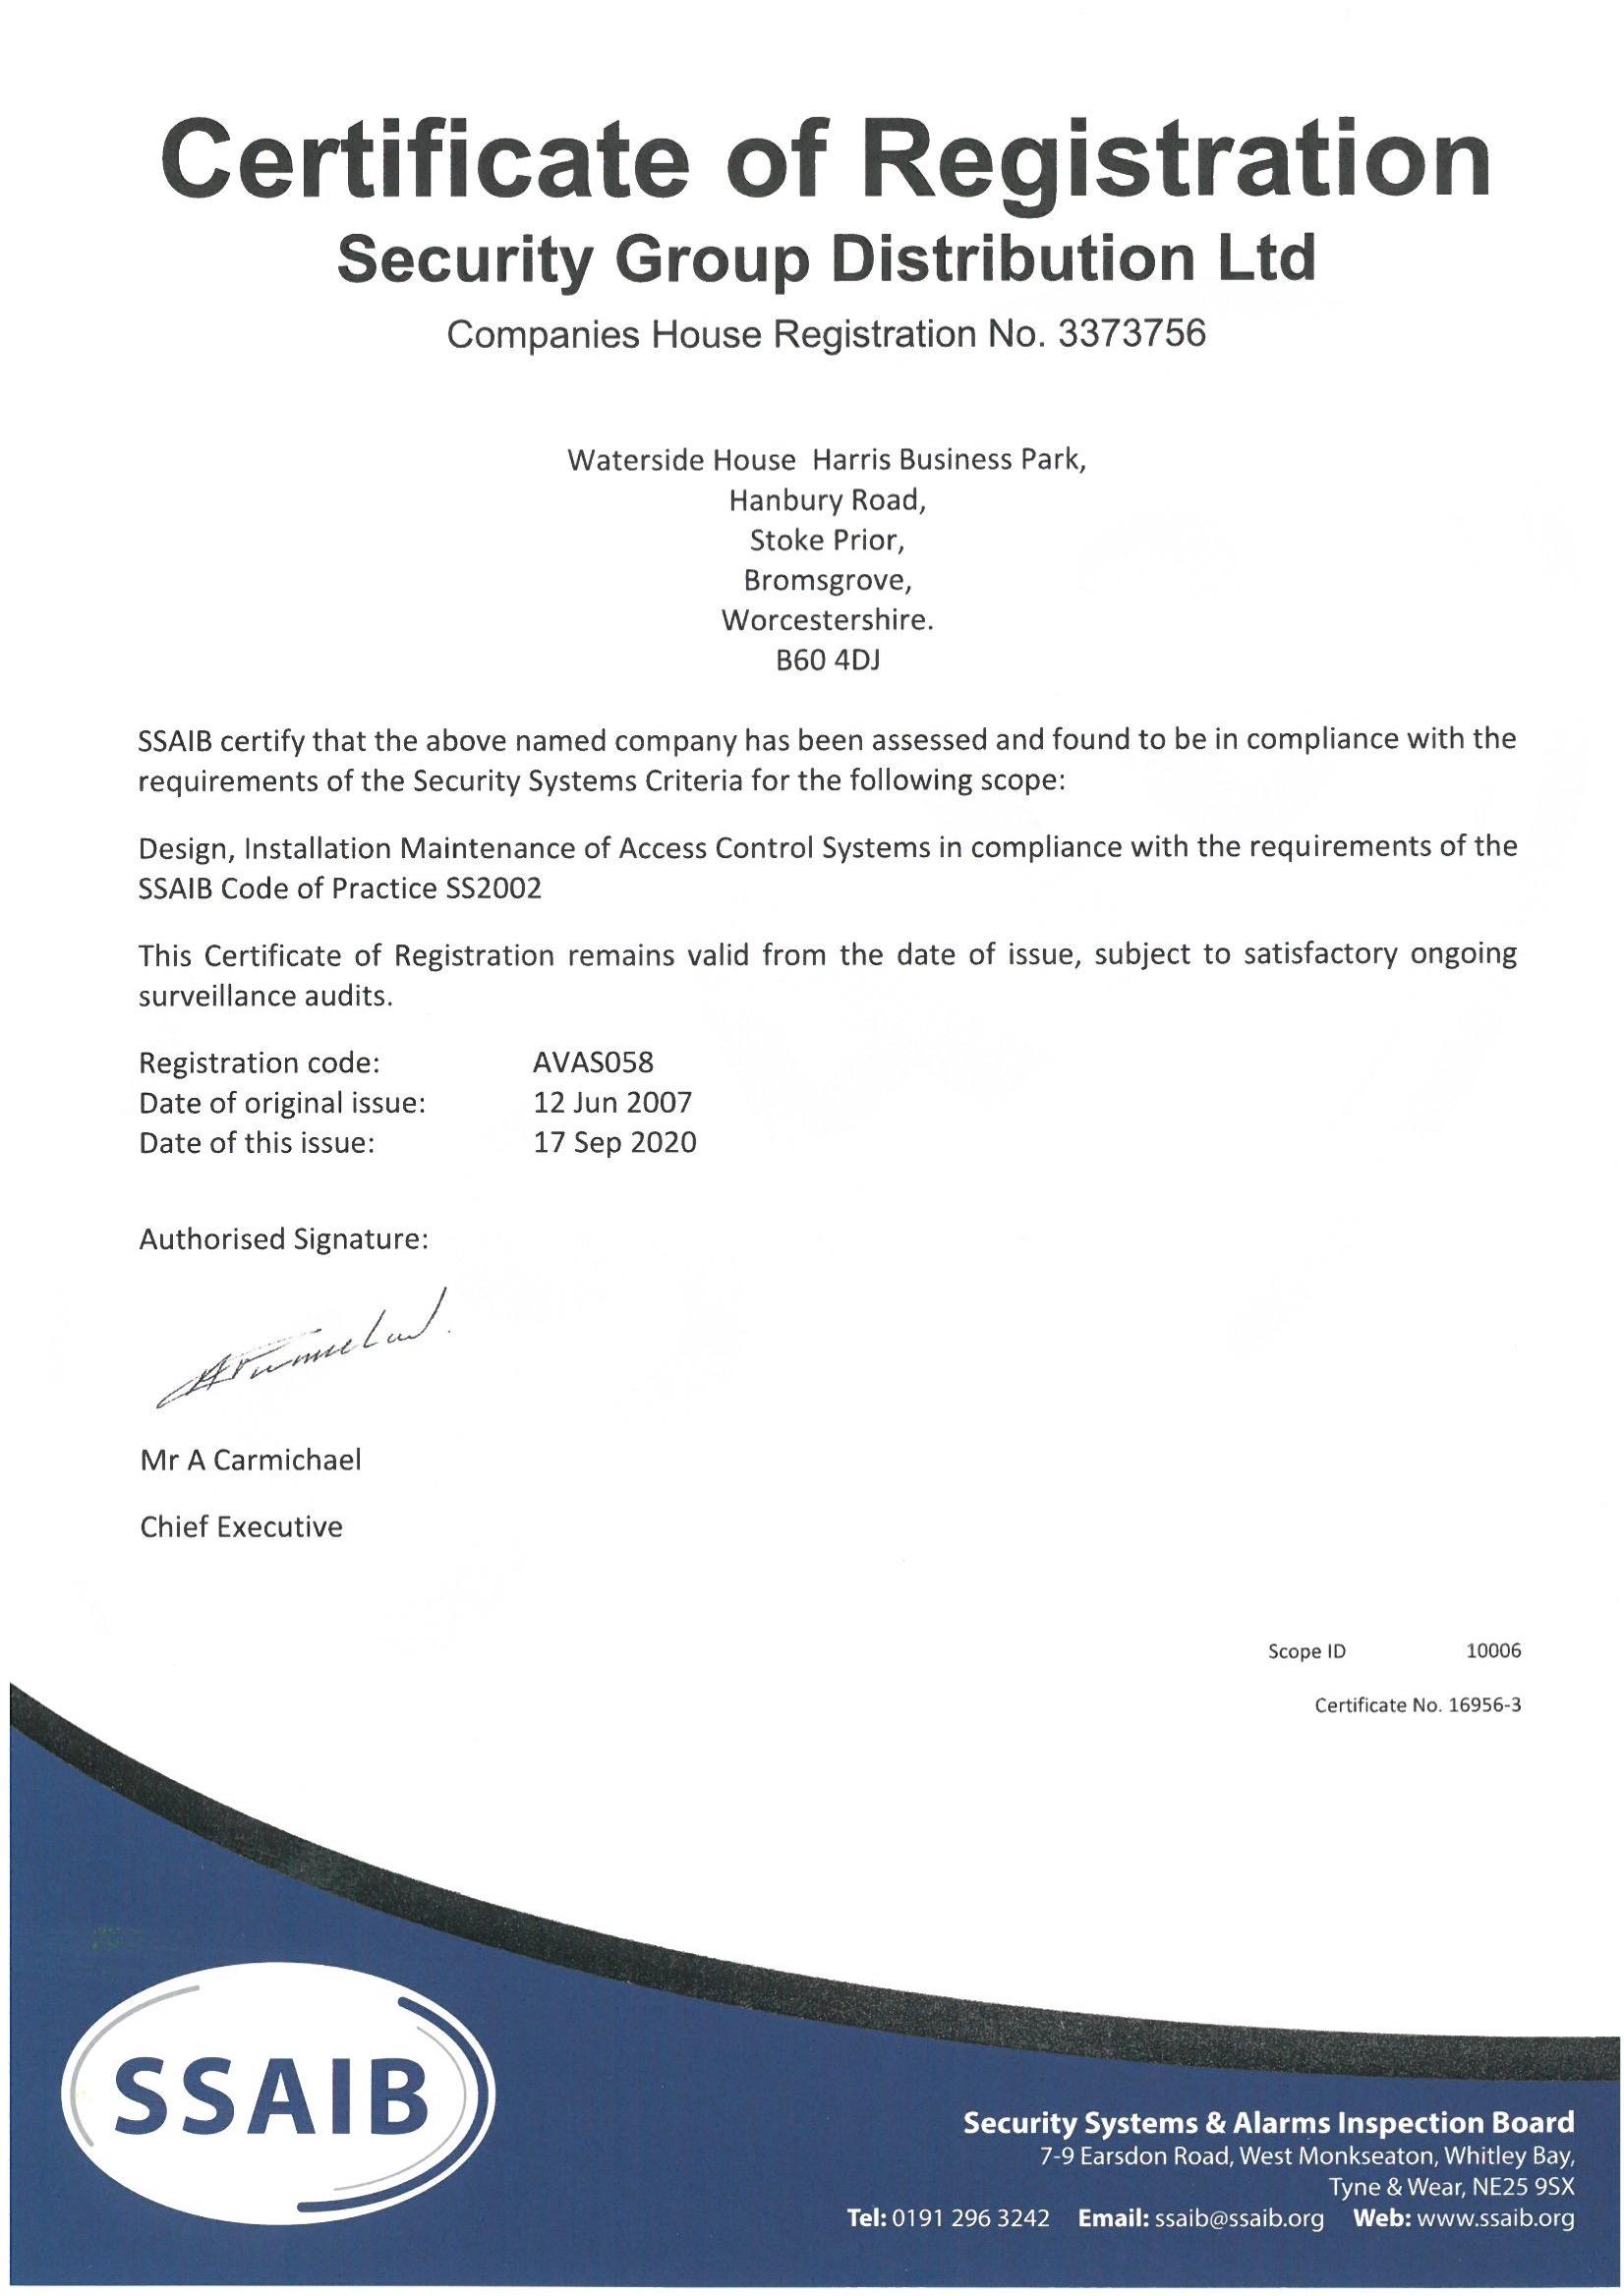 SSAIB Code of Practice SS2002 Certificate No. 16956